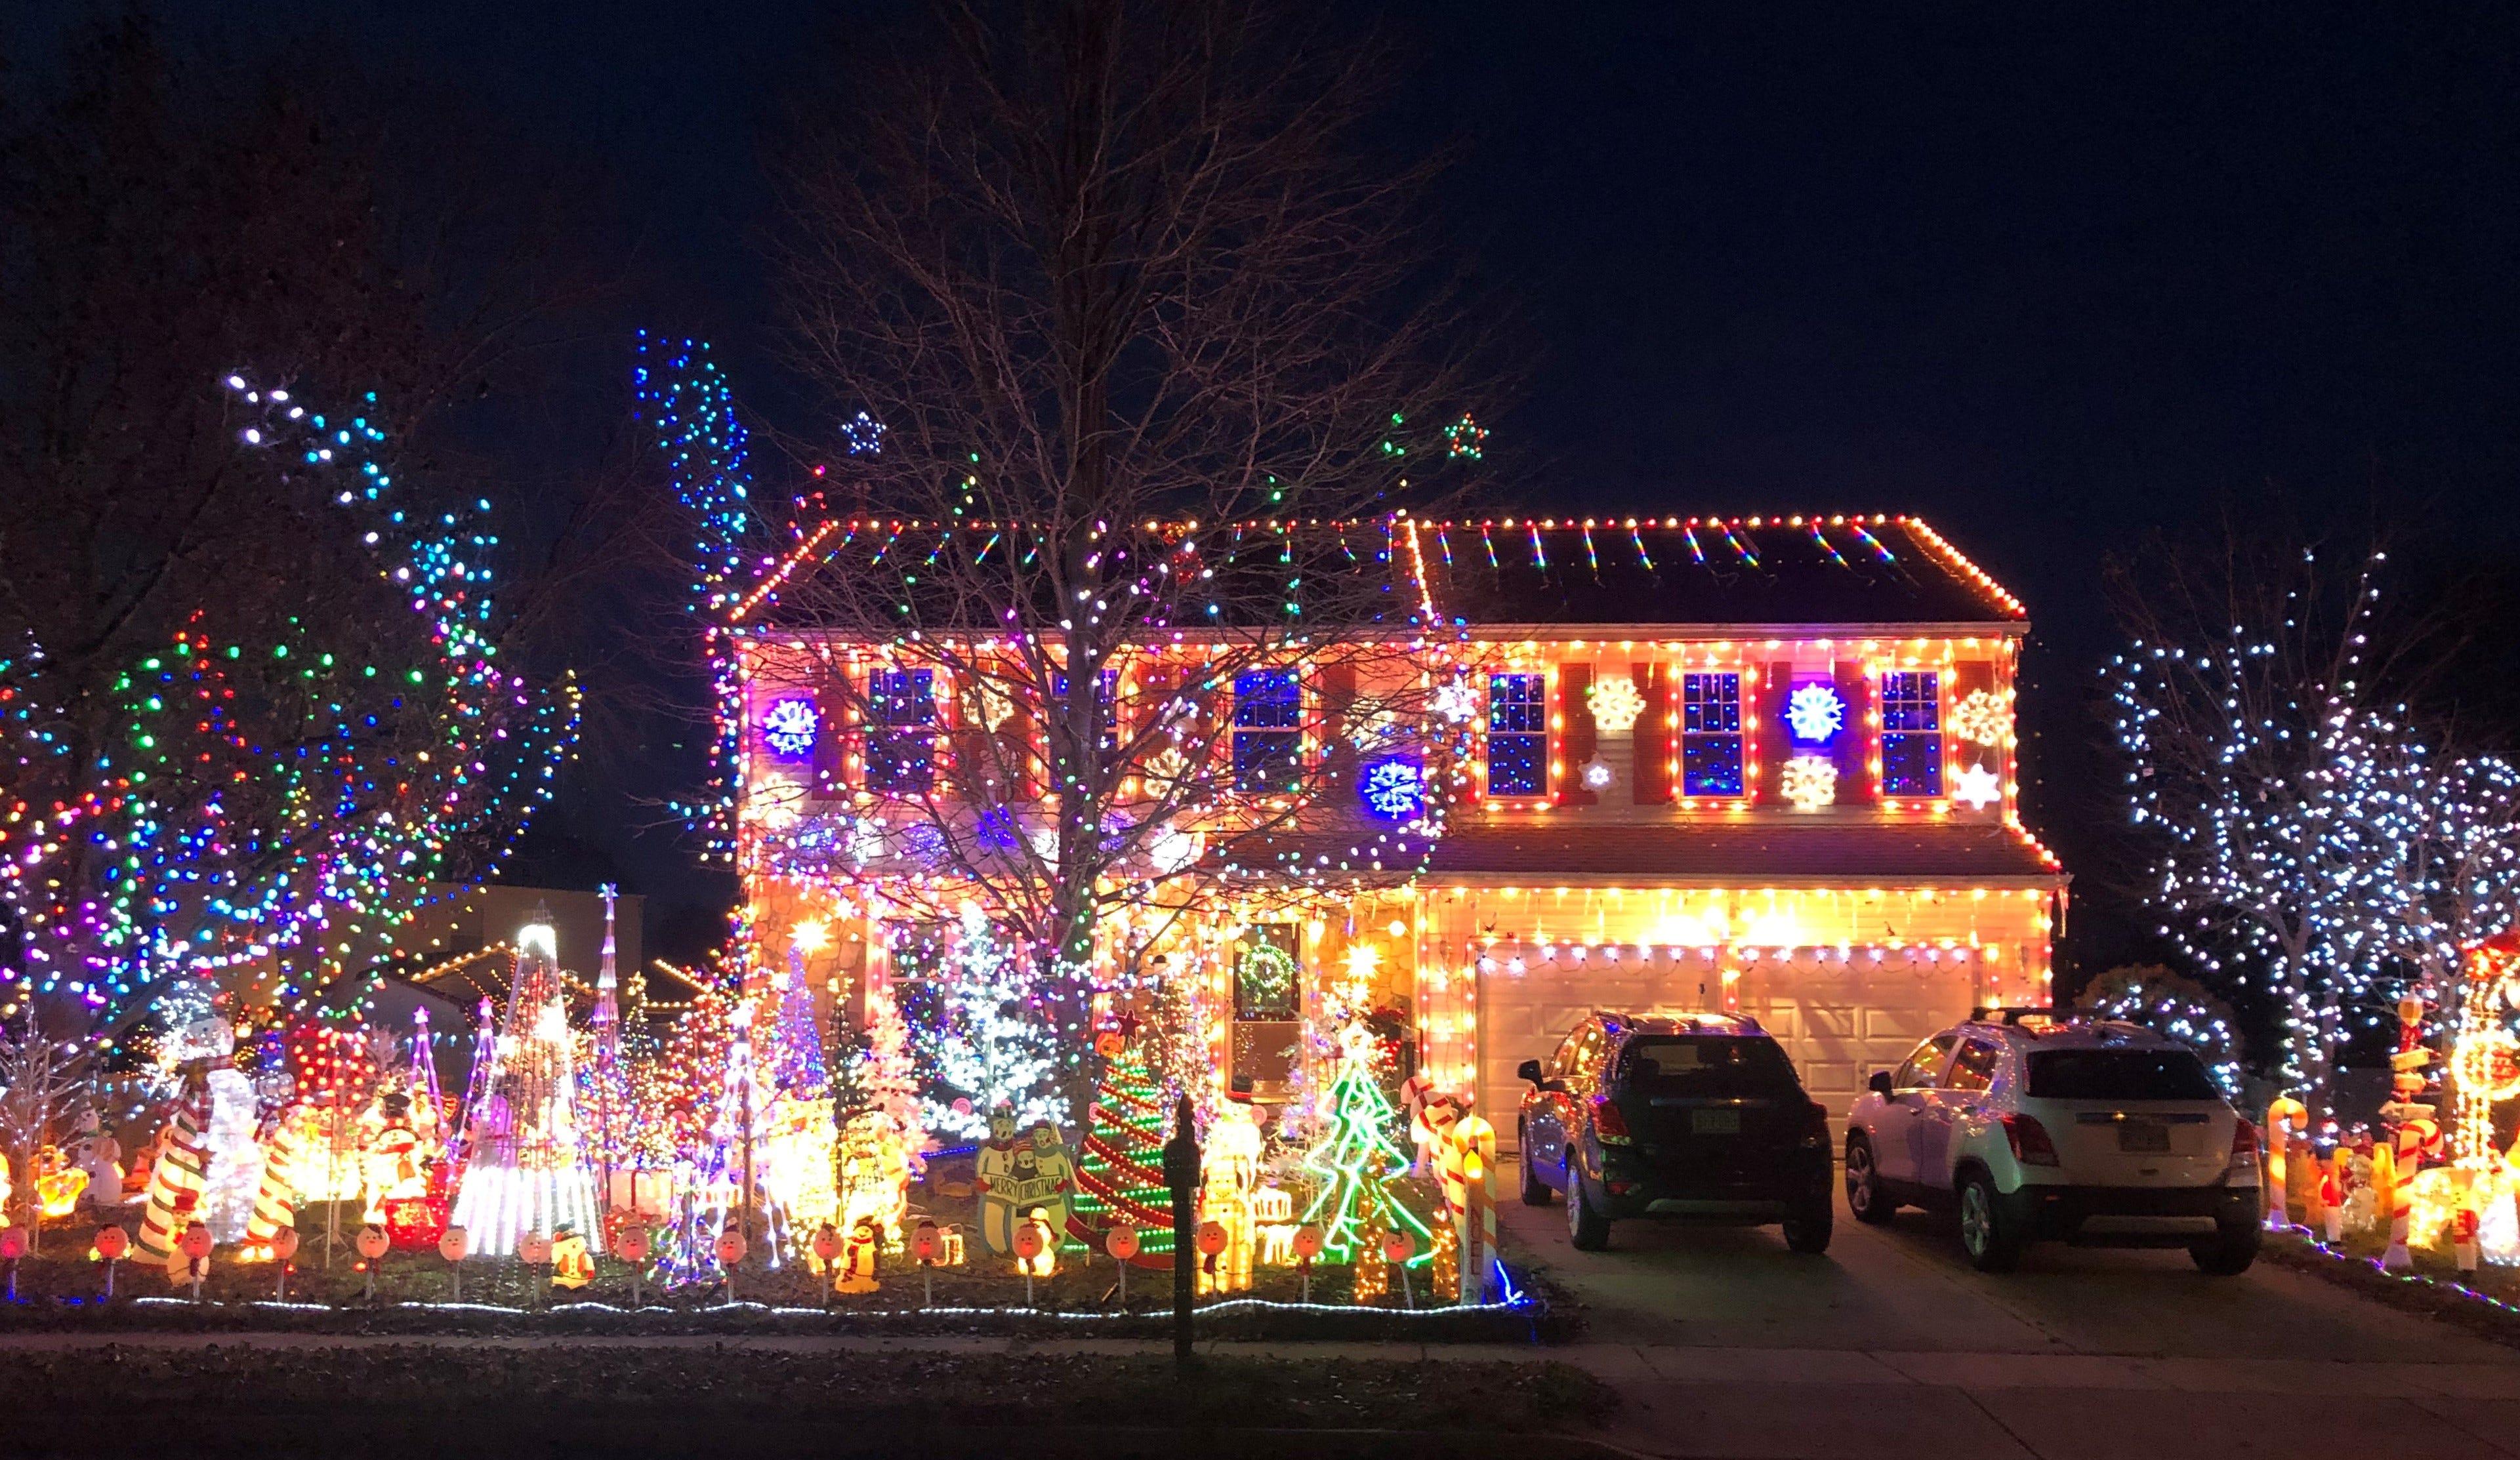 Christmas home lighting Crazy Xmas House Atco Christmas Lights Amazoncom Christmas Lights 2018 Find Best Nj Home Displays Using Google Map